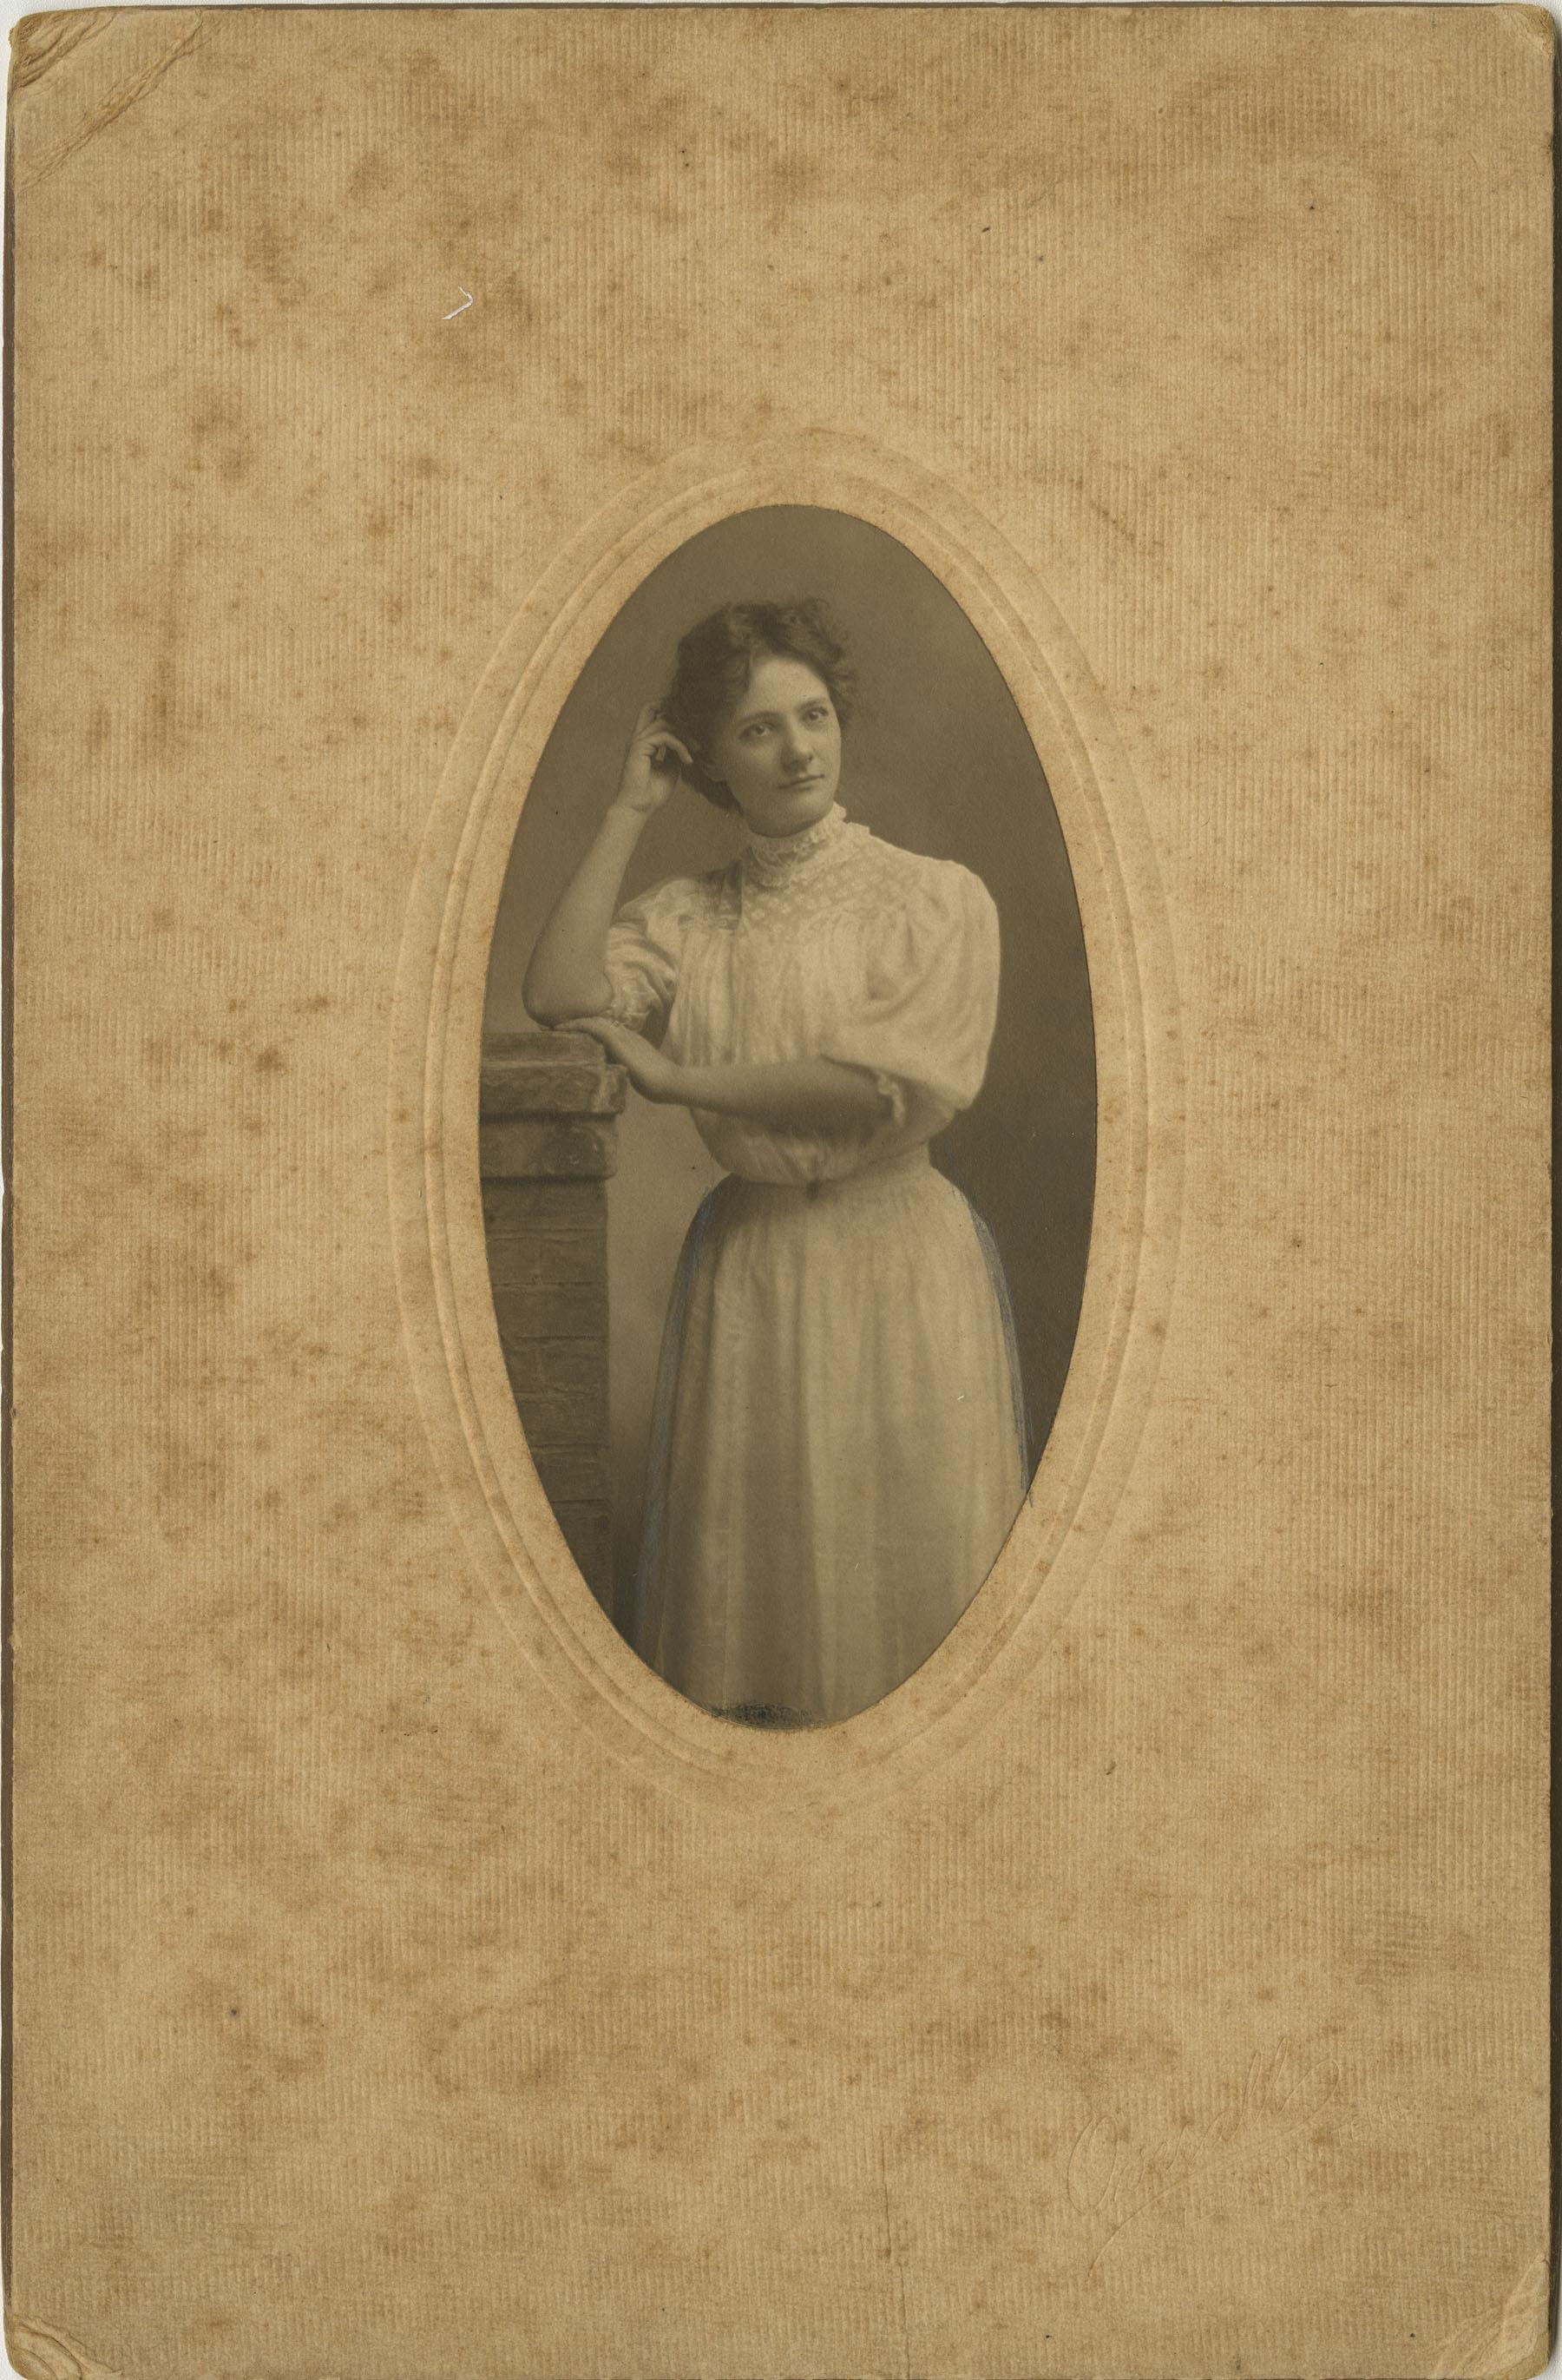 Wilhelmina McLeod Portrait